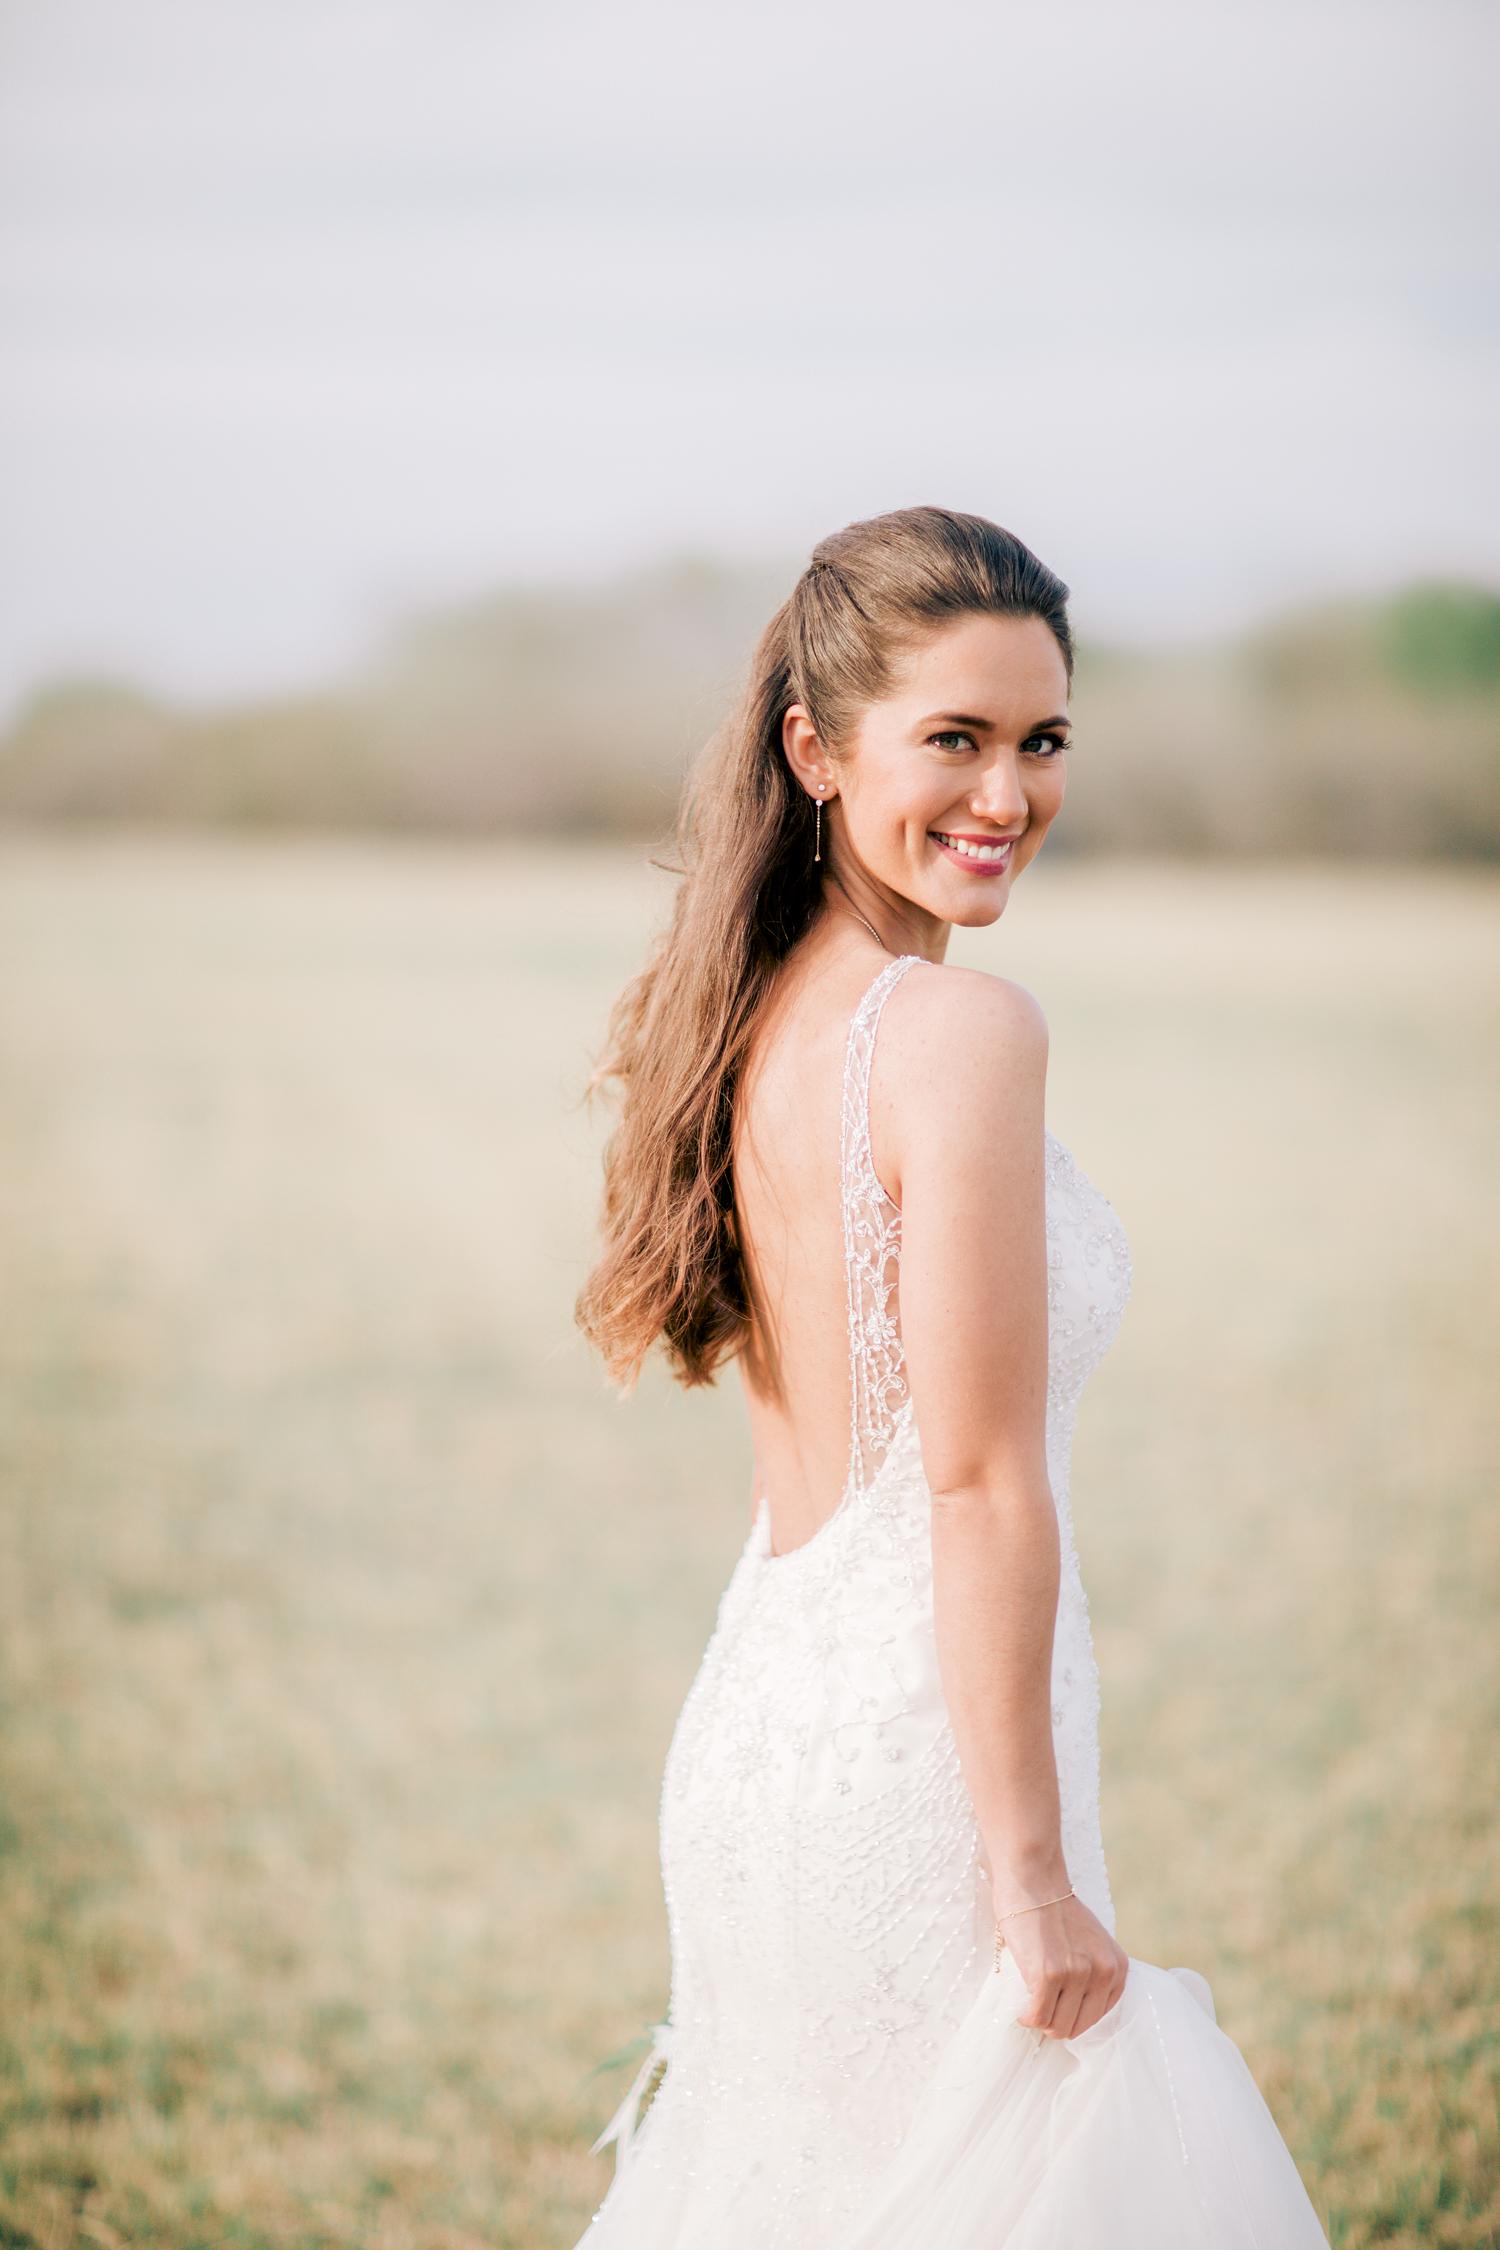 alaa-marzouk-photography-rgvweddingphotographer-rio-grande-valley-mathis-wedding-bridal-bride-san-antonio-portrait-weddings-mcallen-126.jpg